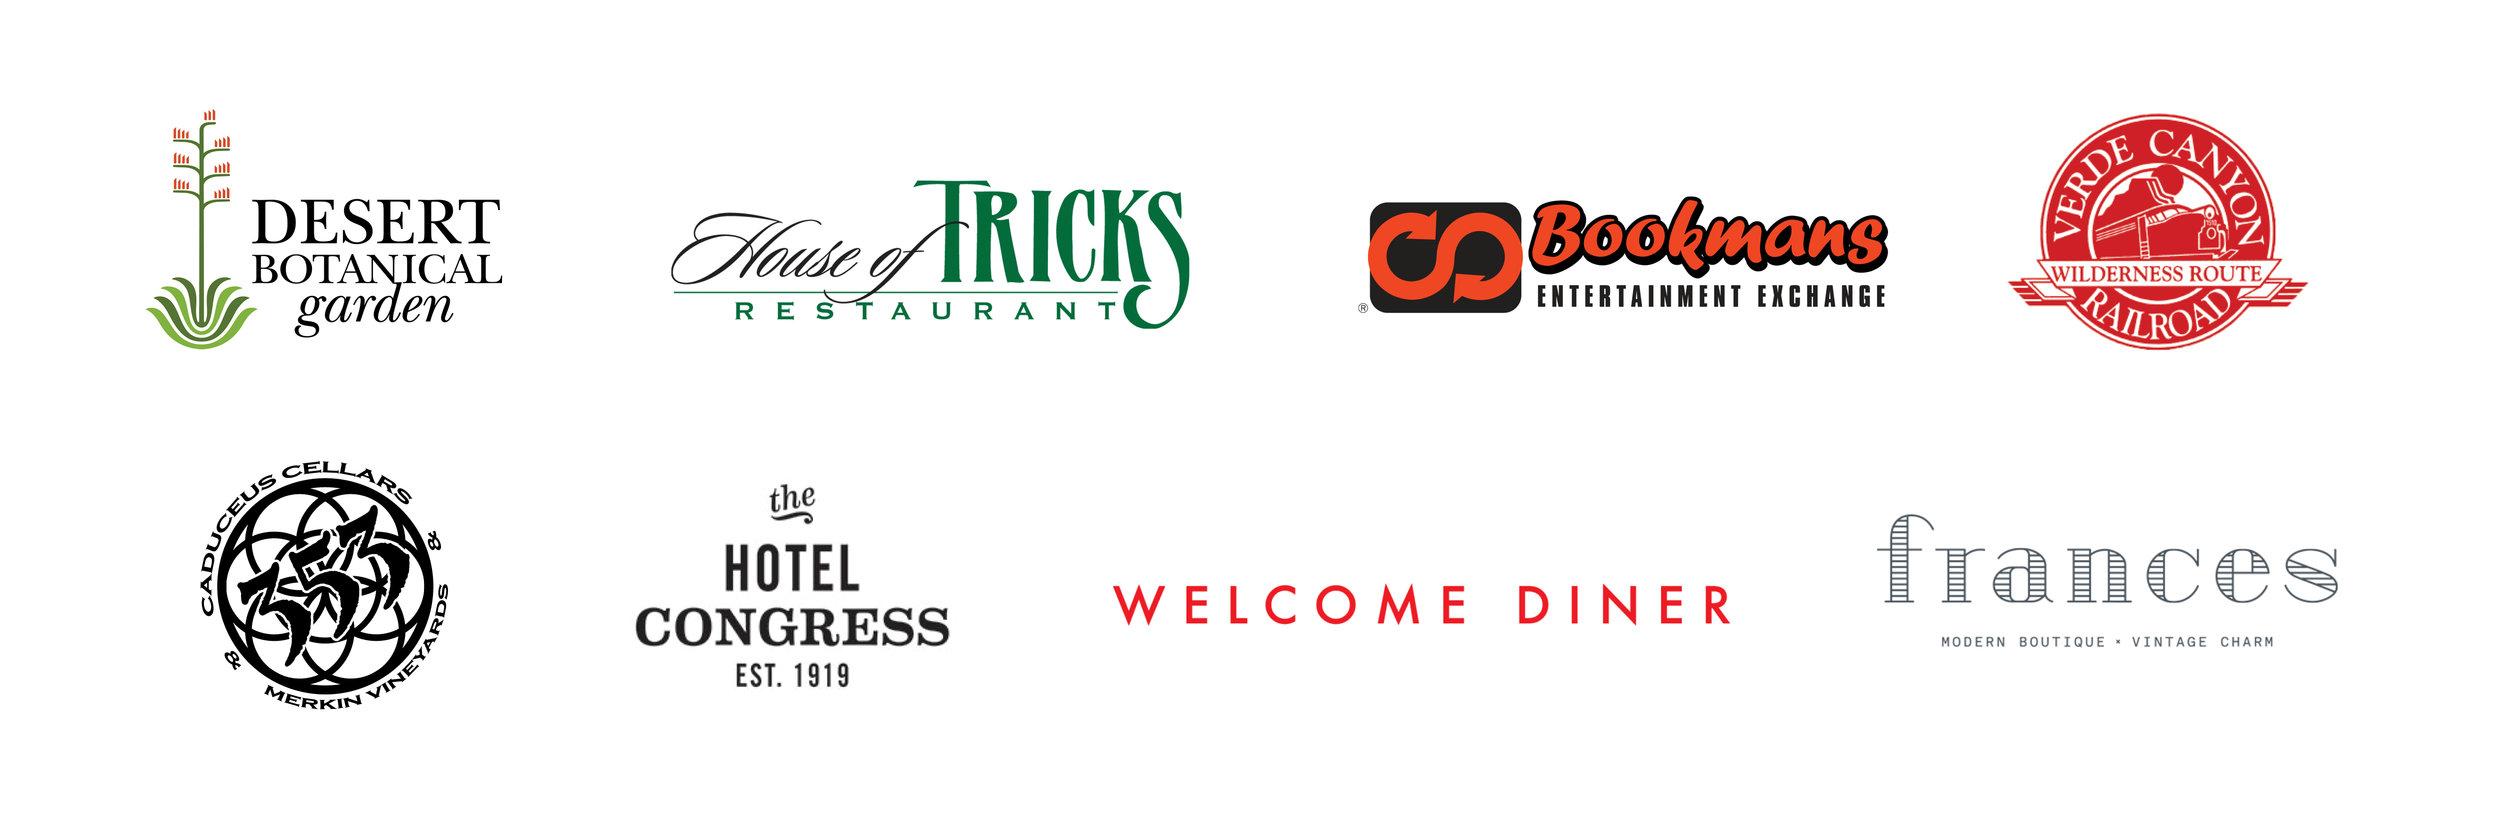 BusinessPartners2.jpg